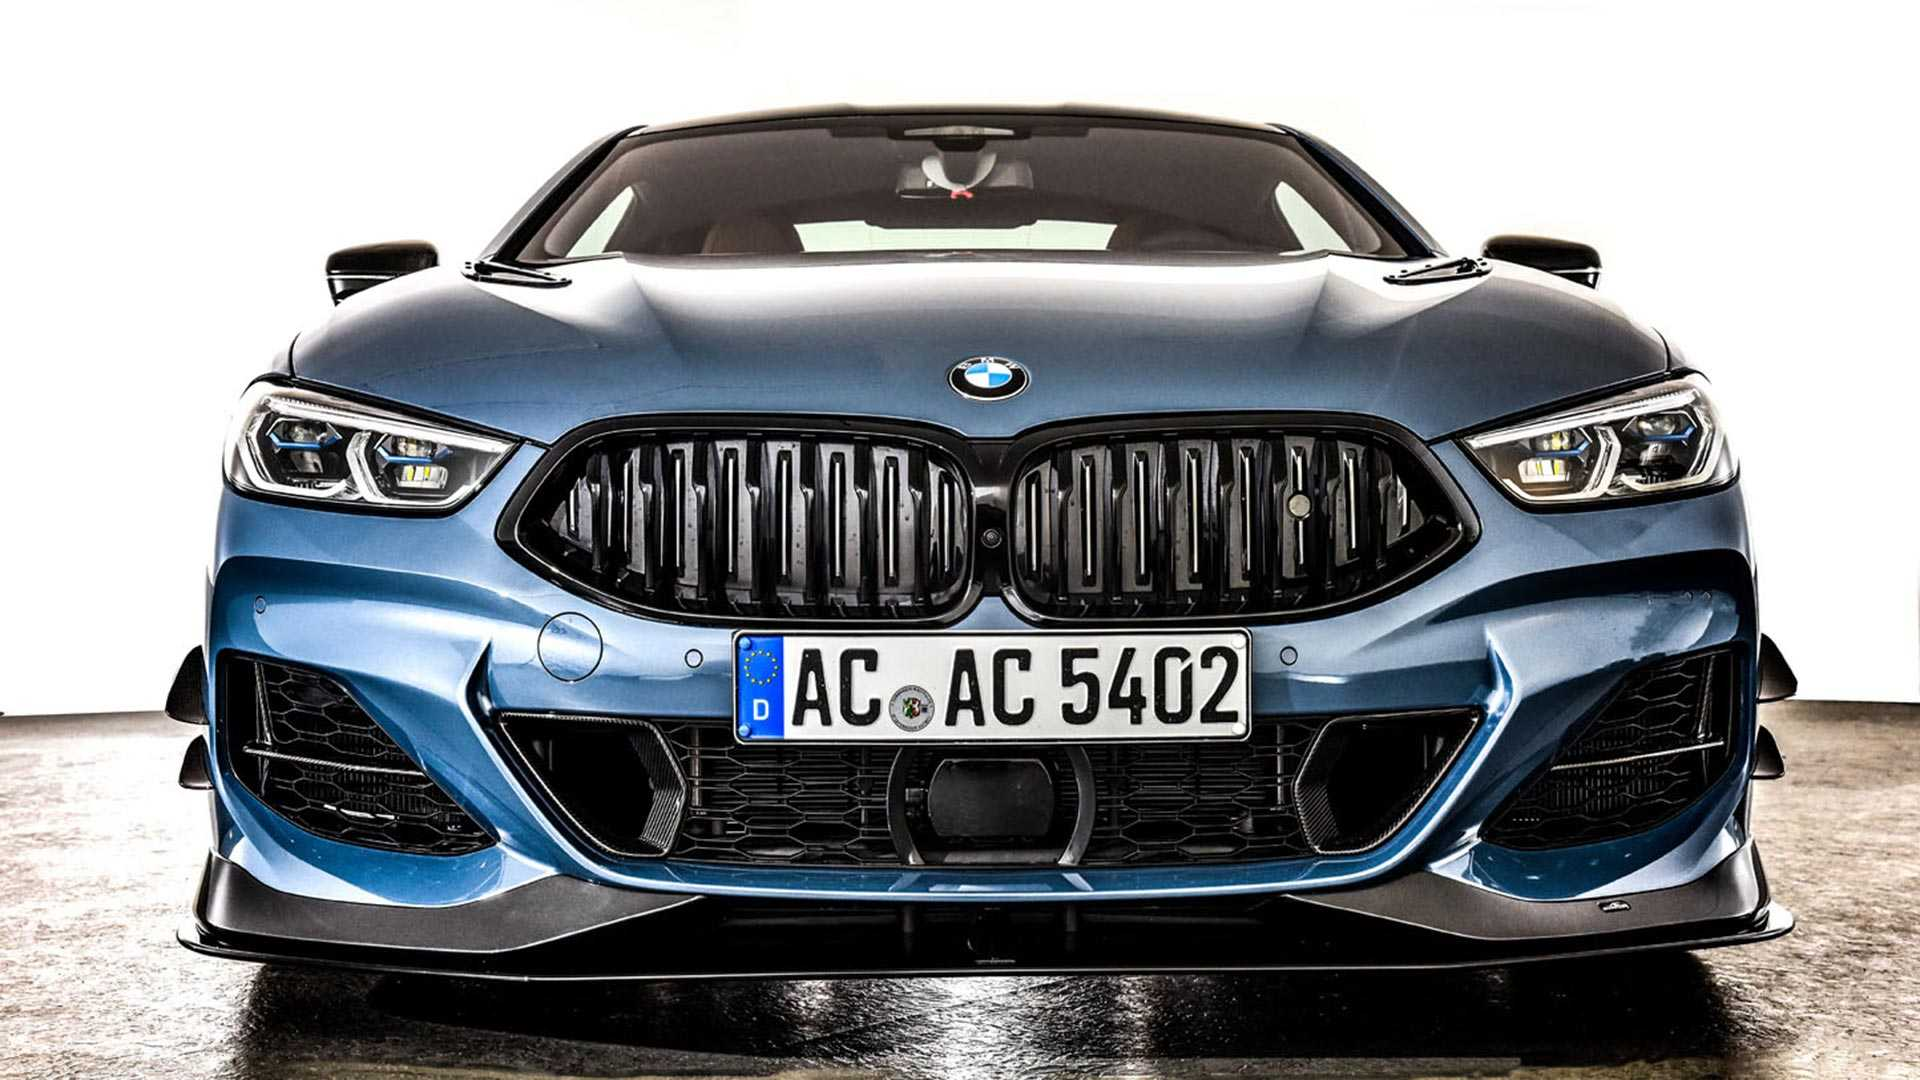 BMW Série 8 Coupé by AC Schnitzer